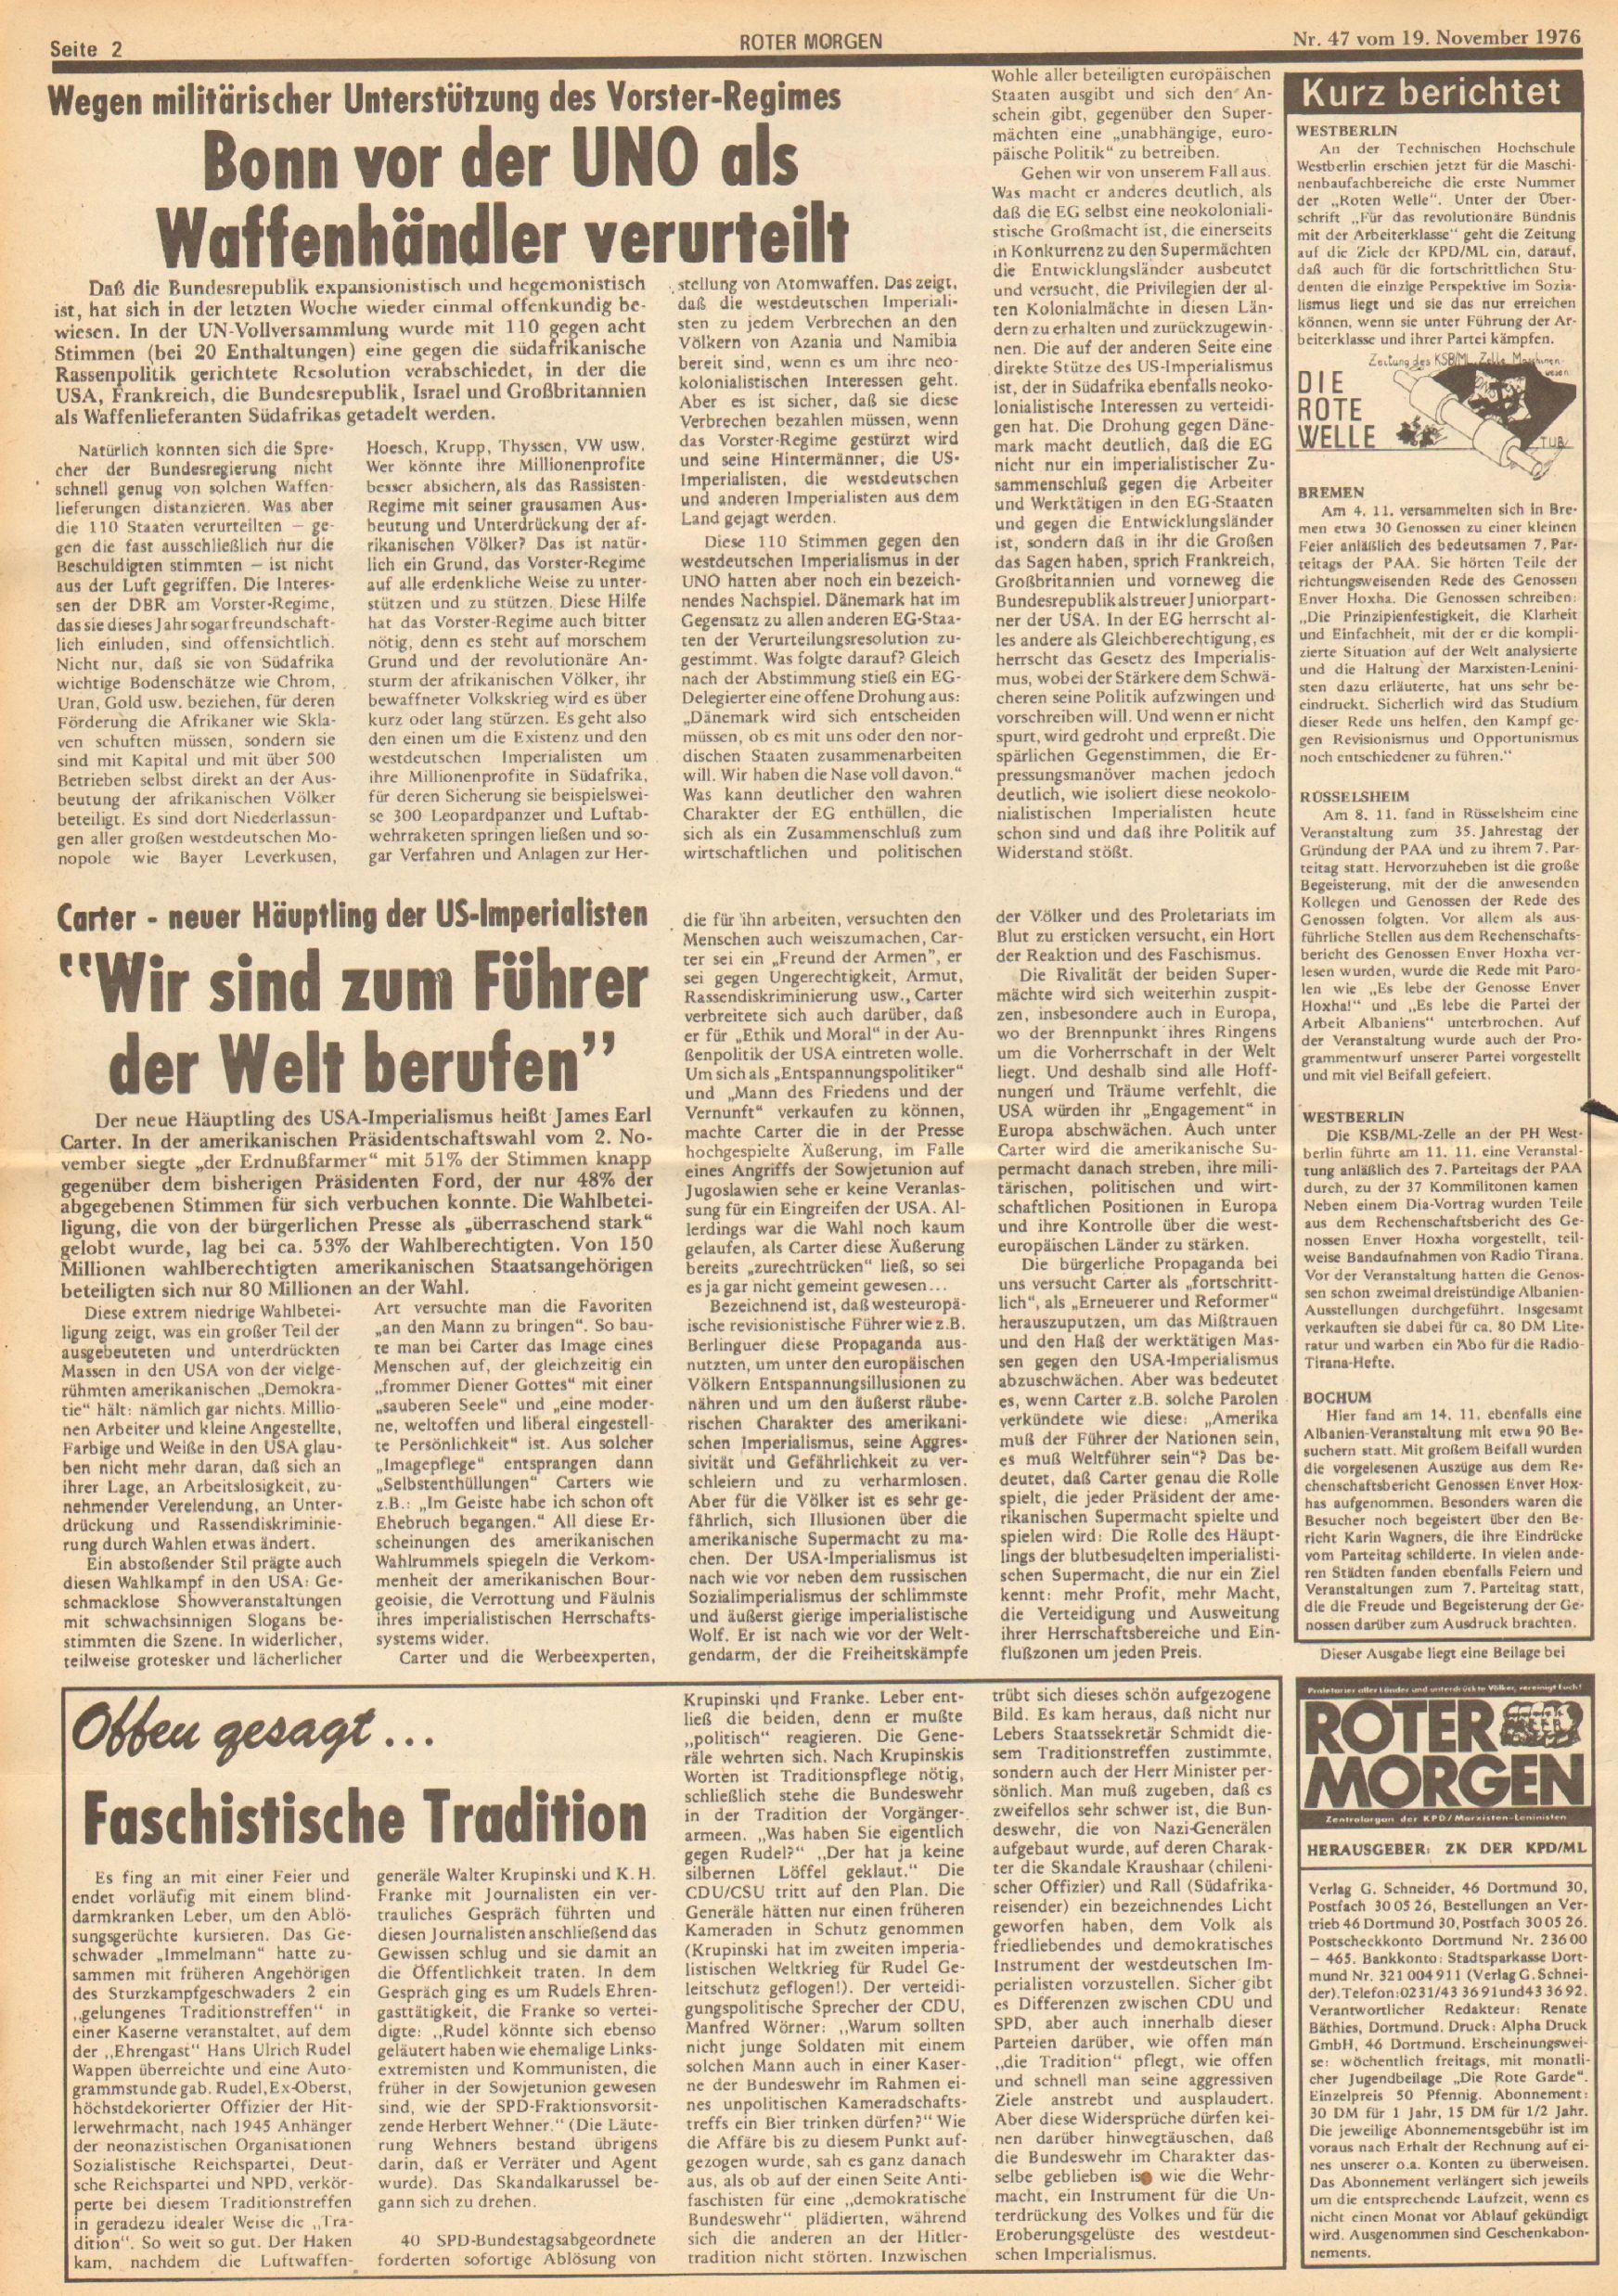 Roter Morgen, 10. Jg., 19. November 1976, Nr. 47, Seite 2